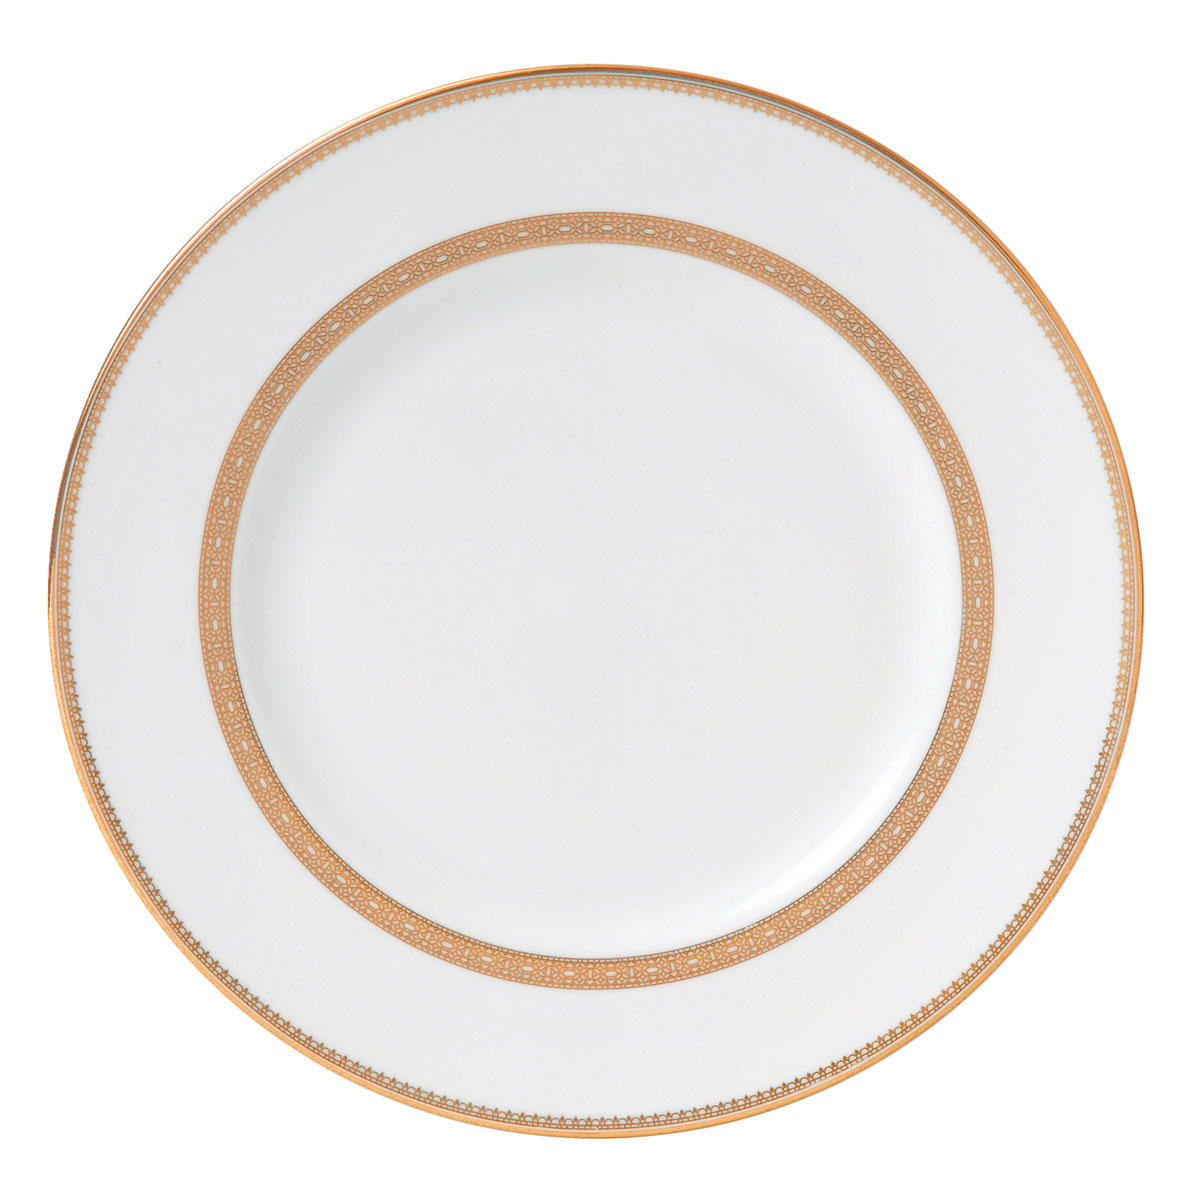 "Vera Wang Wedgwood Vera Lace Gold Dinner Plate 10.75"""